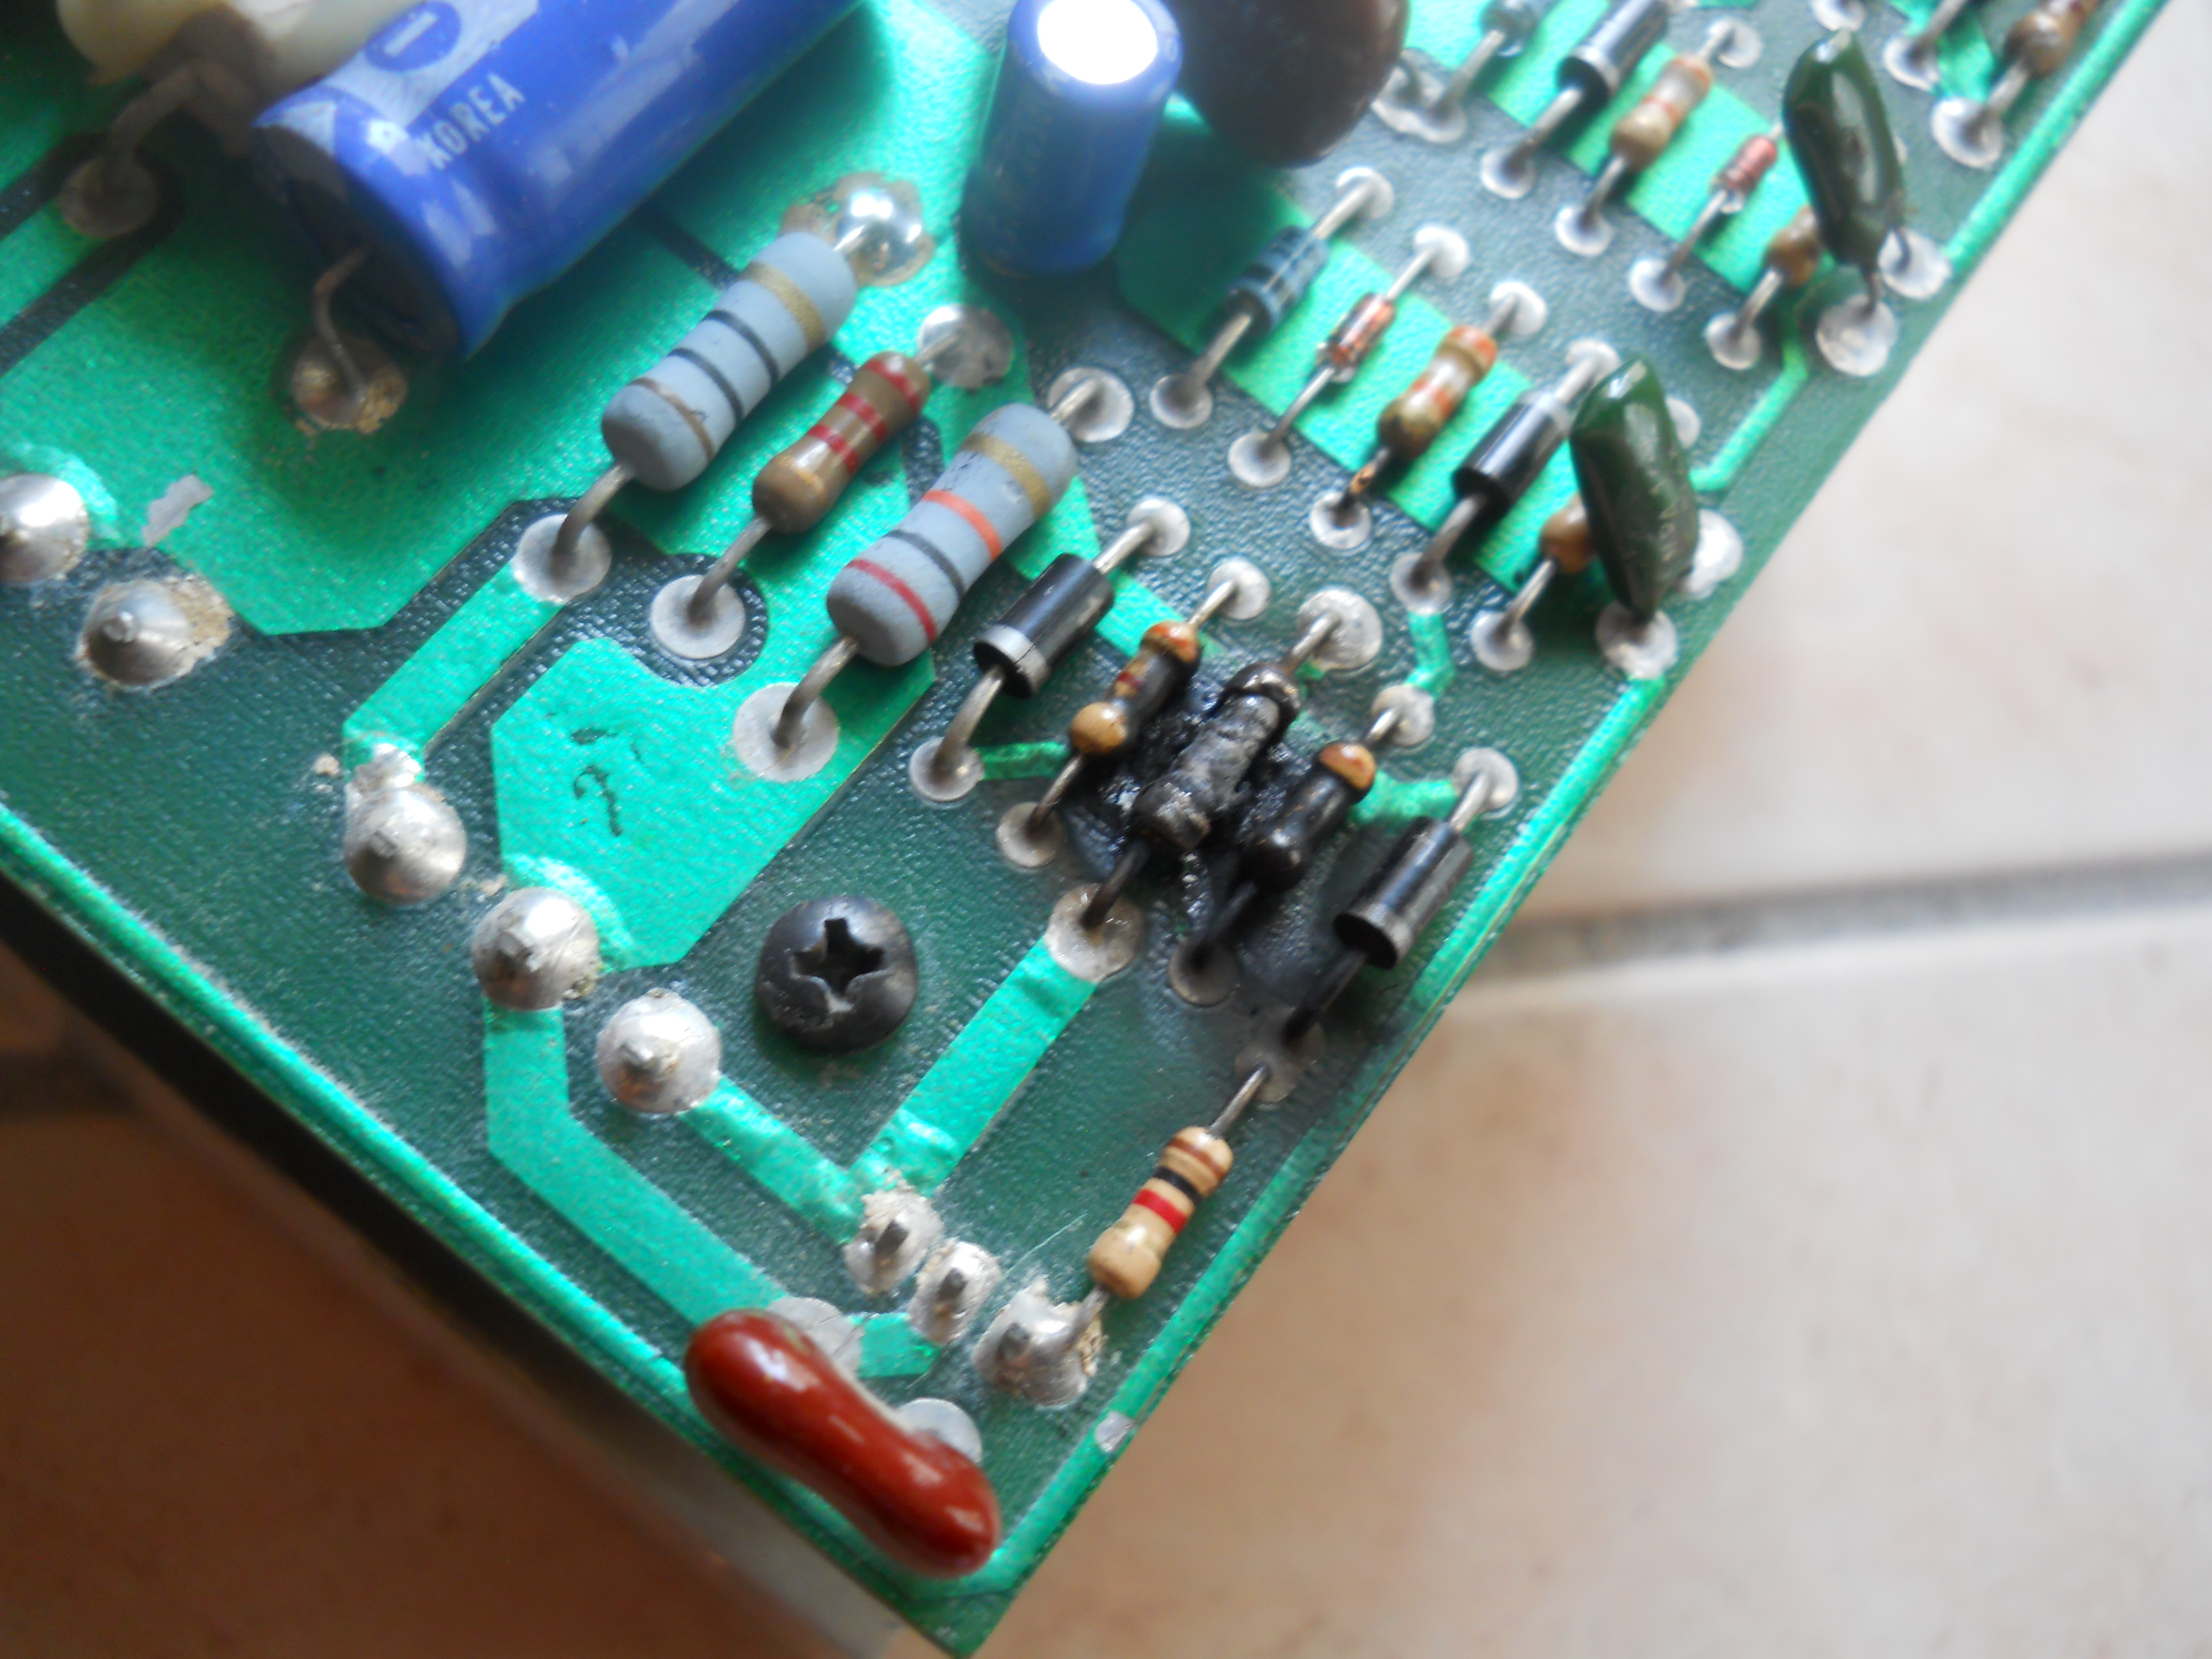 Crest 8001 da riparare 14397973821_a773231262_o_d